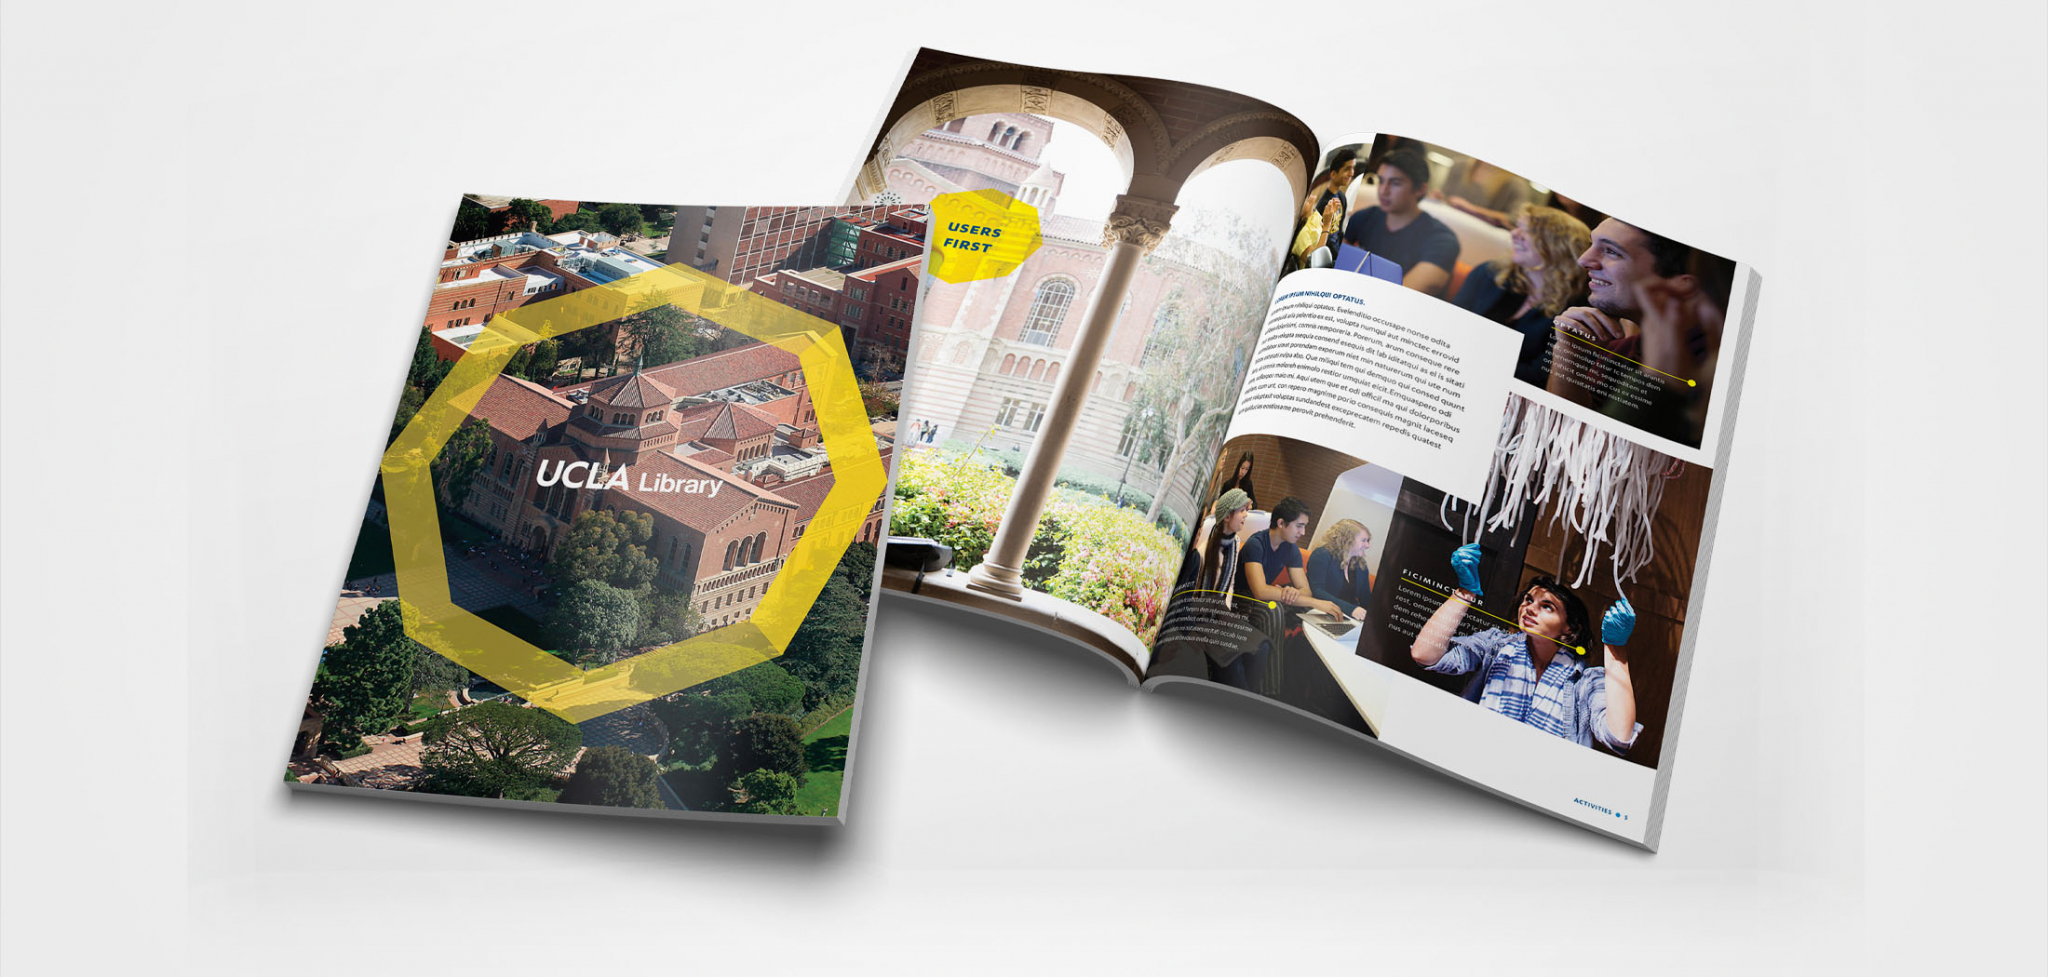 UCLA Library Rebranding Brochure Design